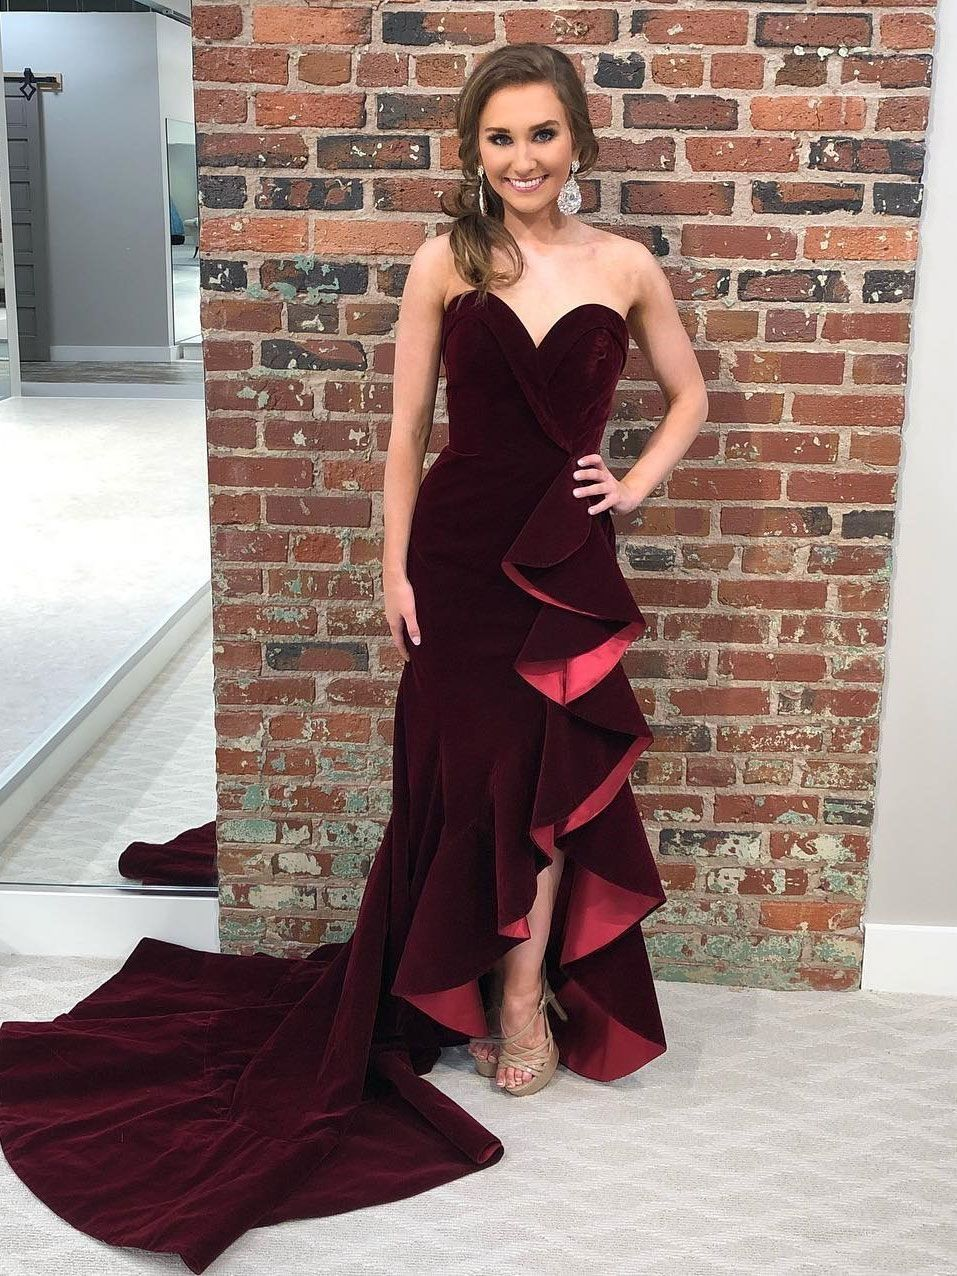 Excellent mermaid prom dresses prom dresses prom dresses long